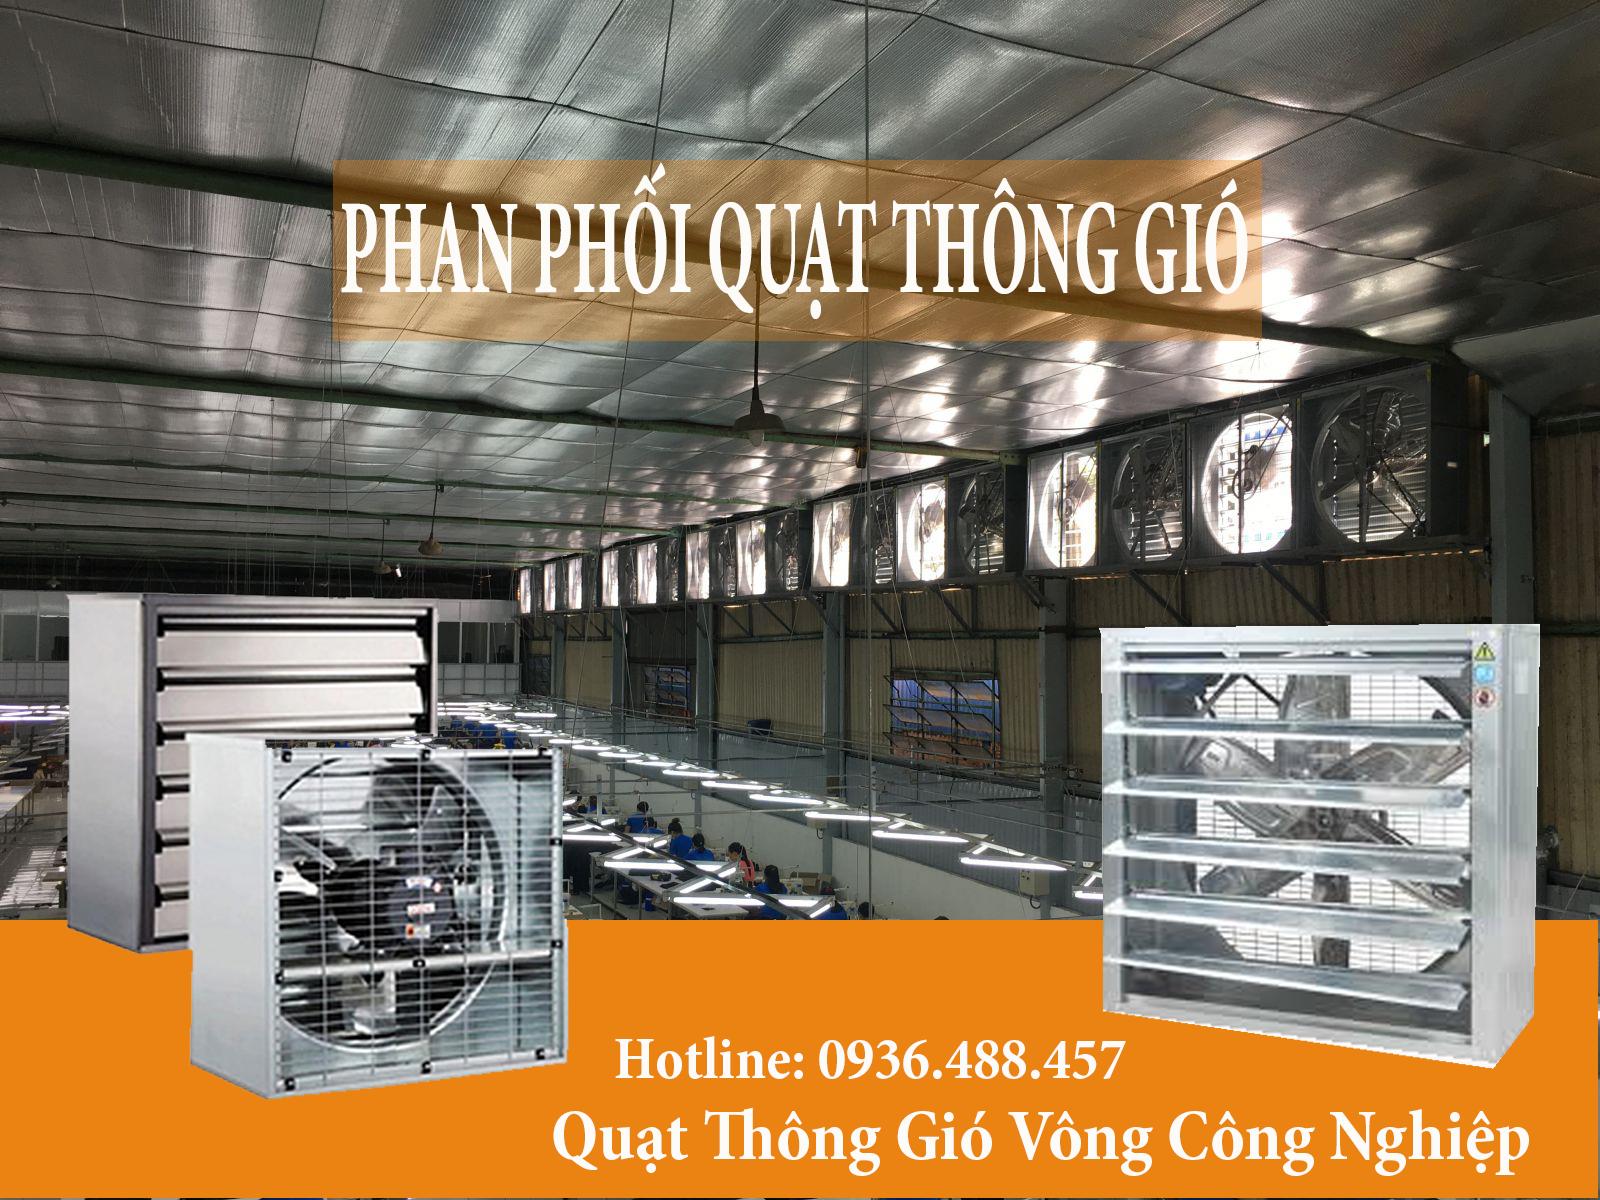 quat-thong-gio-vuong-cong-nghiep-500x500